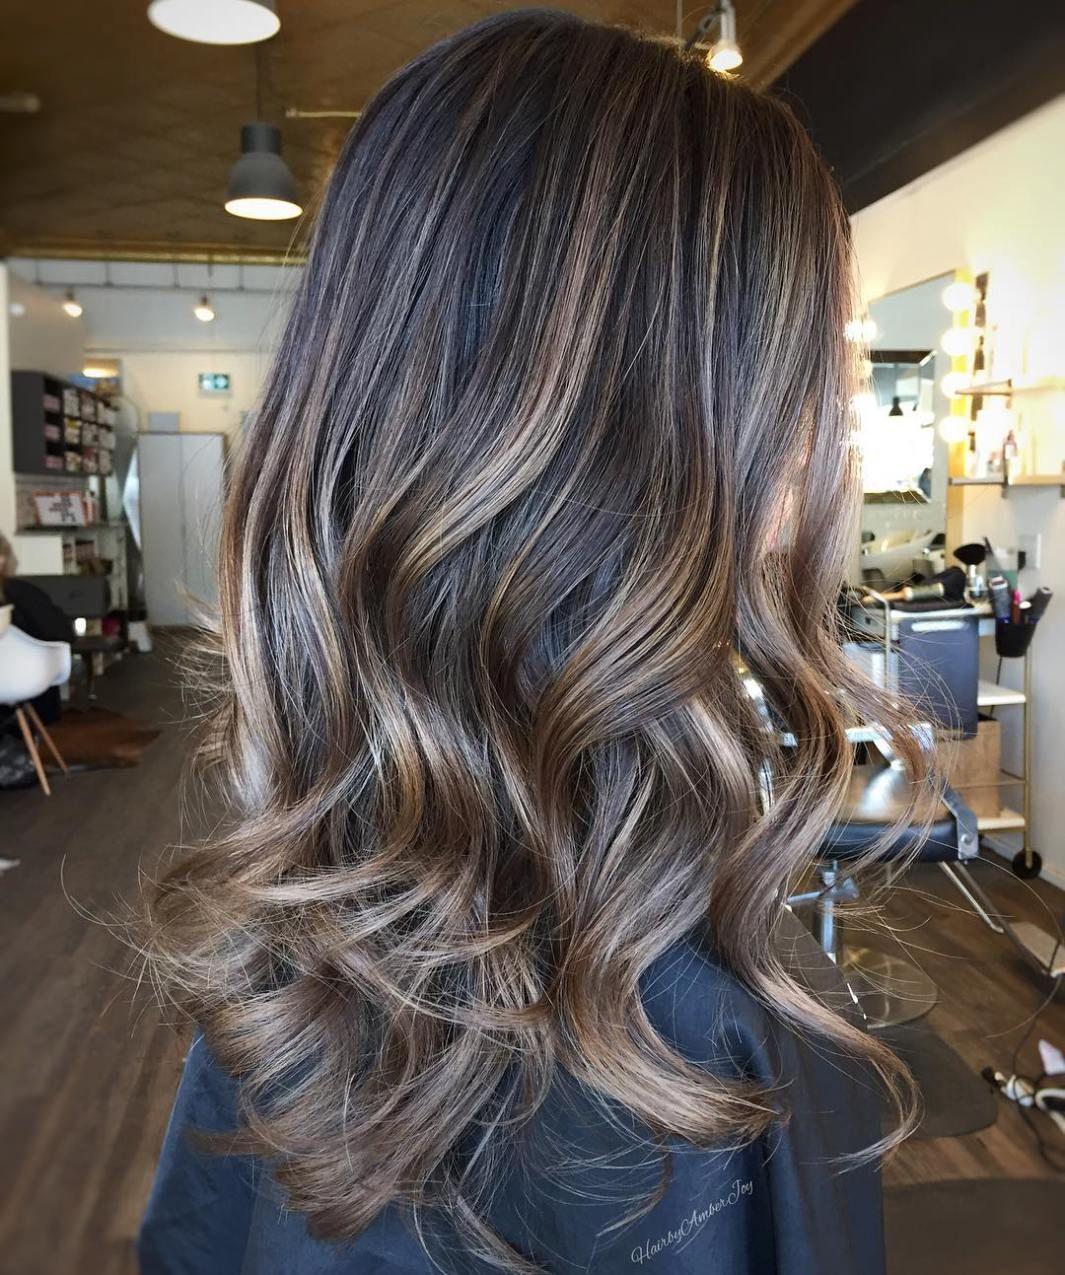 Ash Brown Hair With Ash Blonde Highlights   Vtwctr